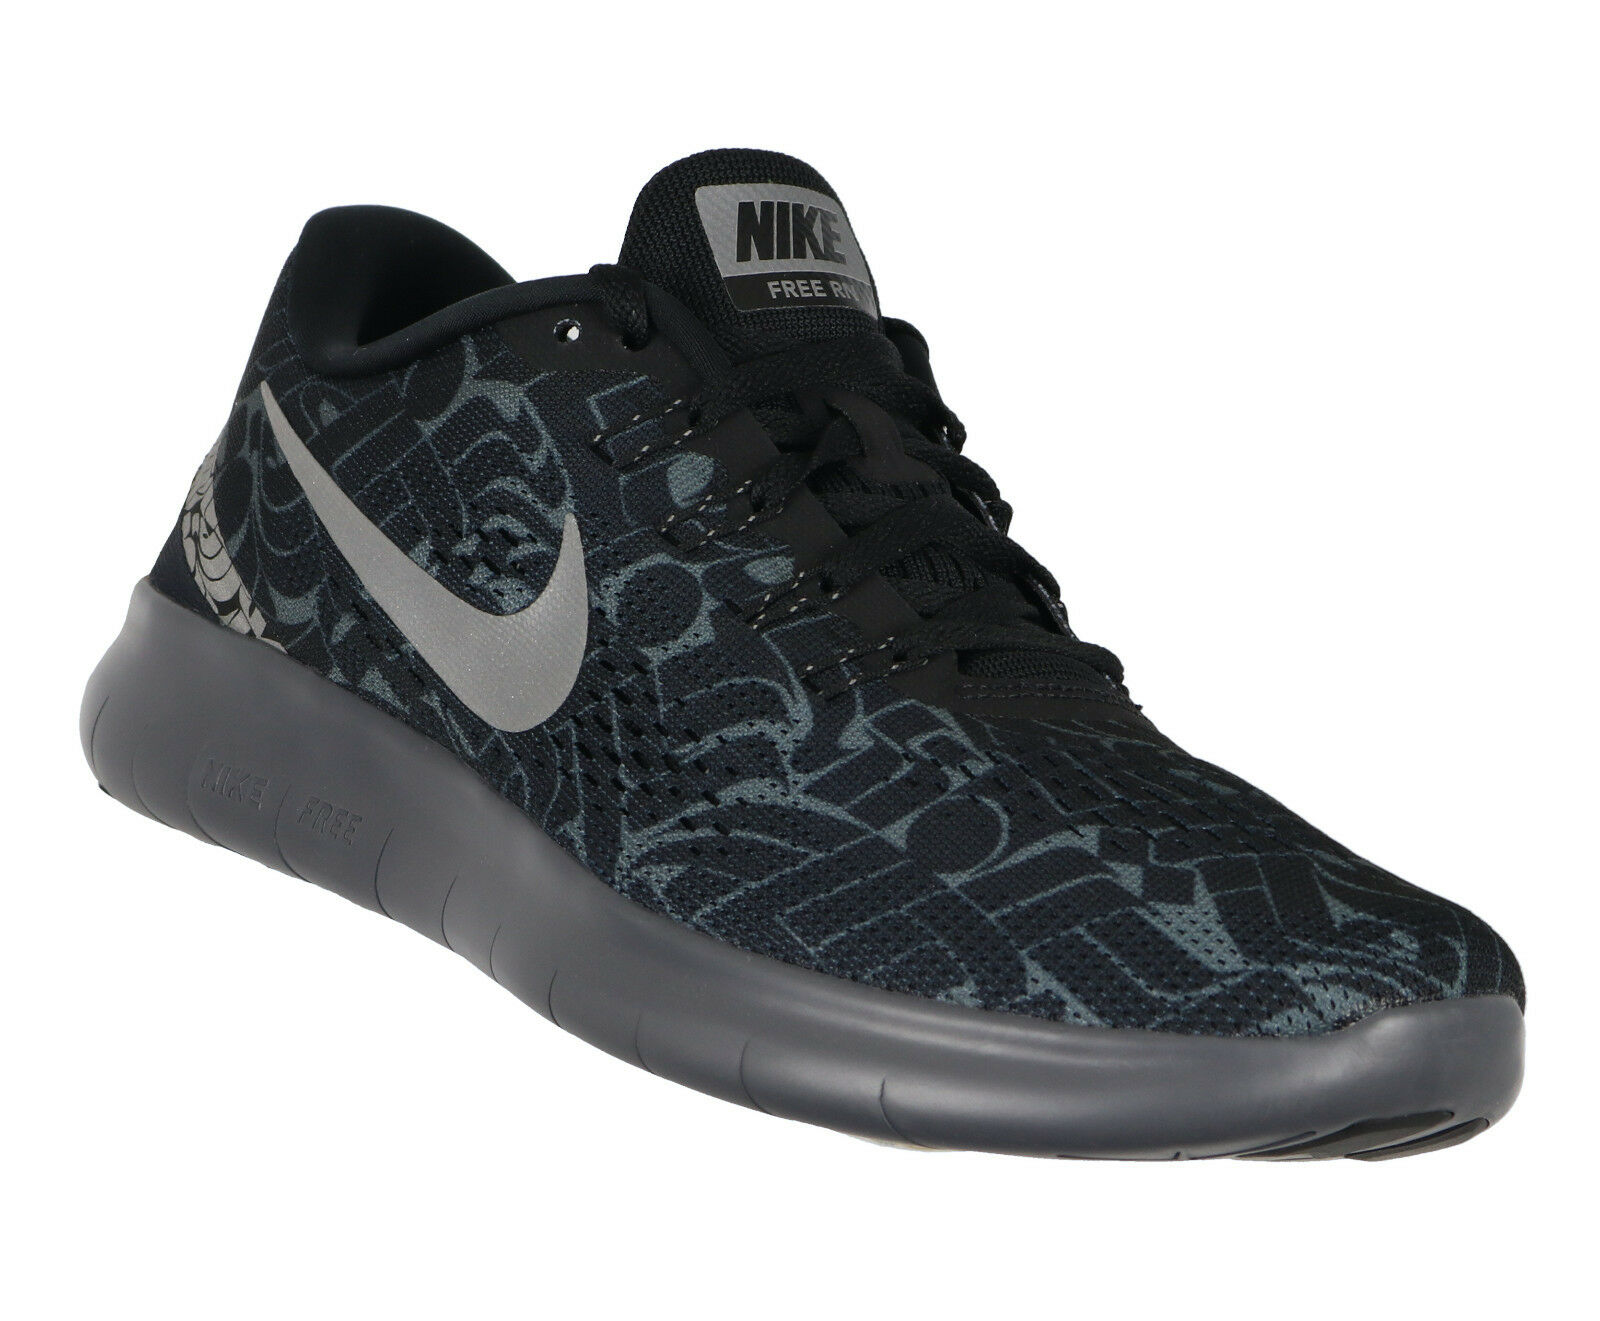 NIKE Women's Free Run x Rostarr Running Shoes sz 9.5 Black Reflective Trainer RN